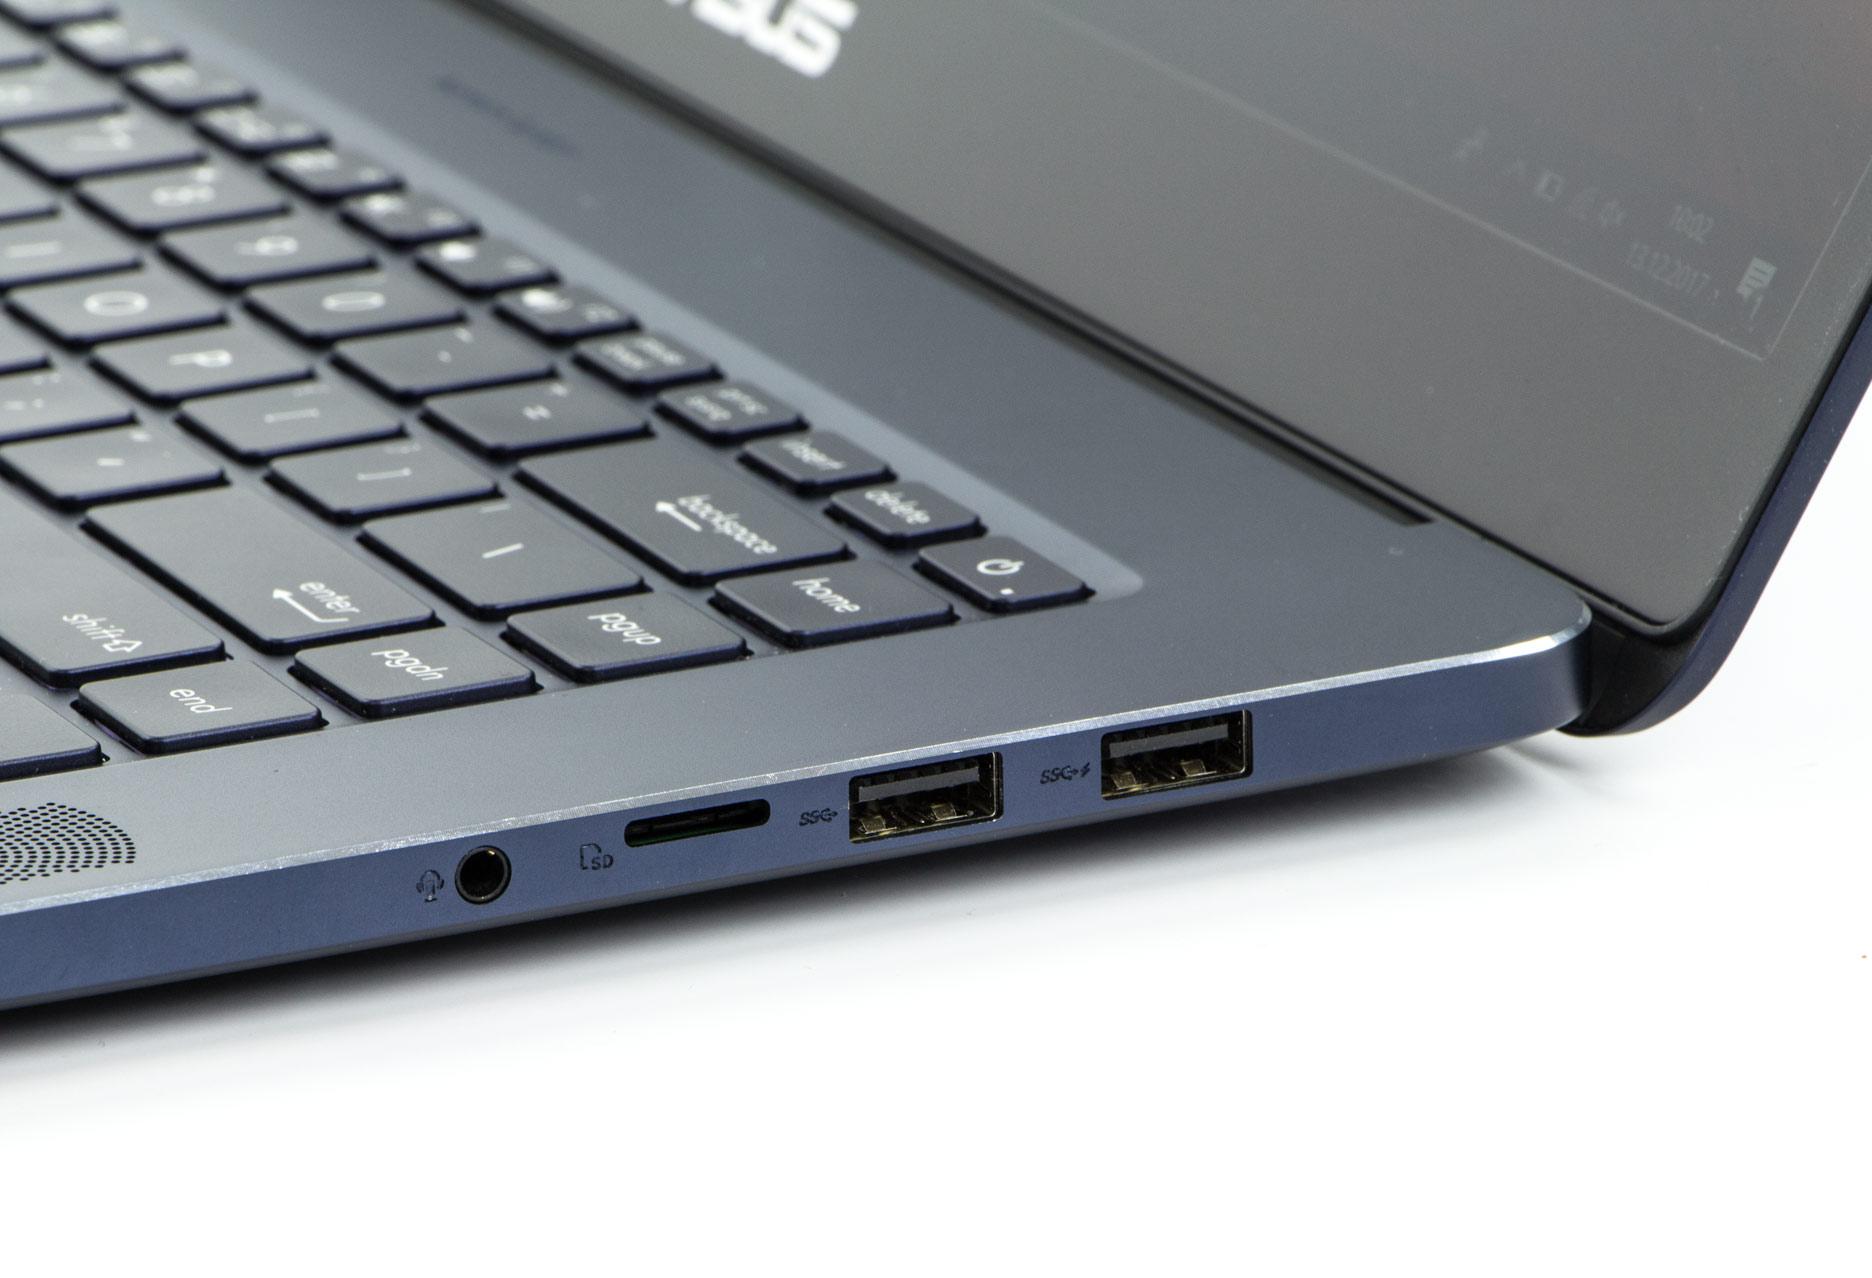 Asus ZenBook Pro UX550VD prawy bok